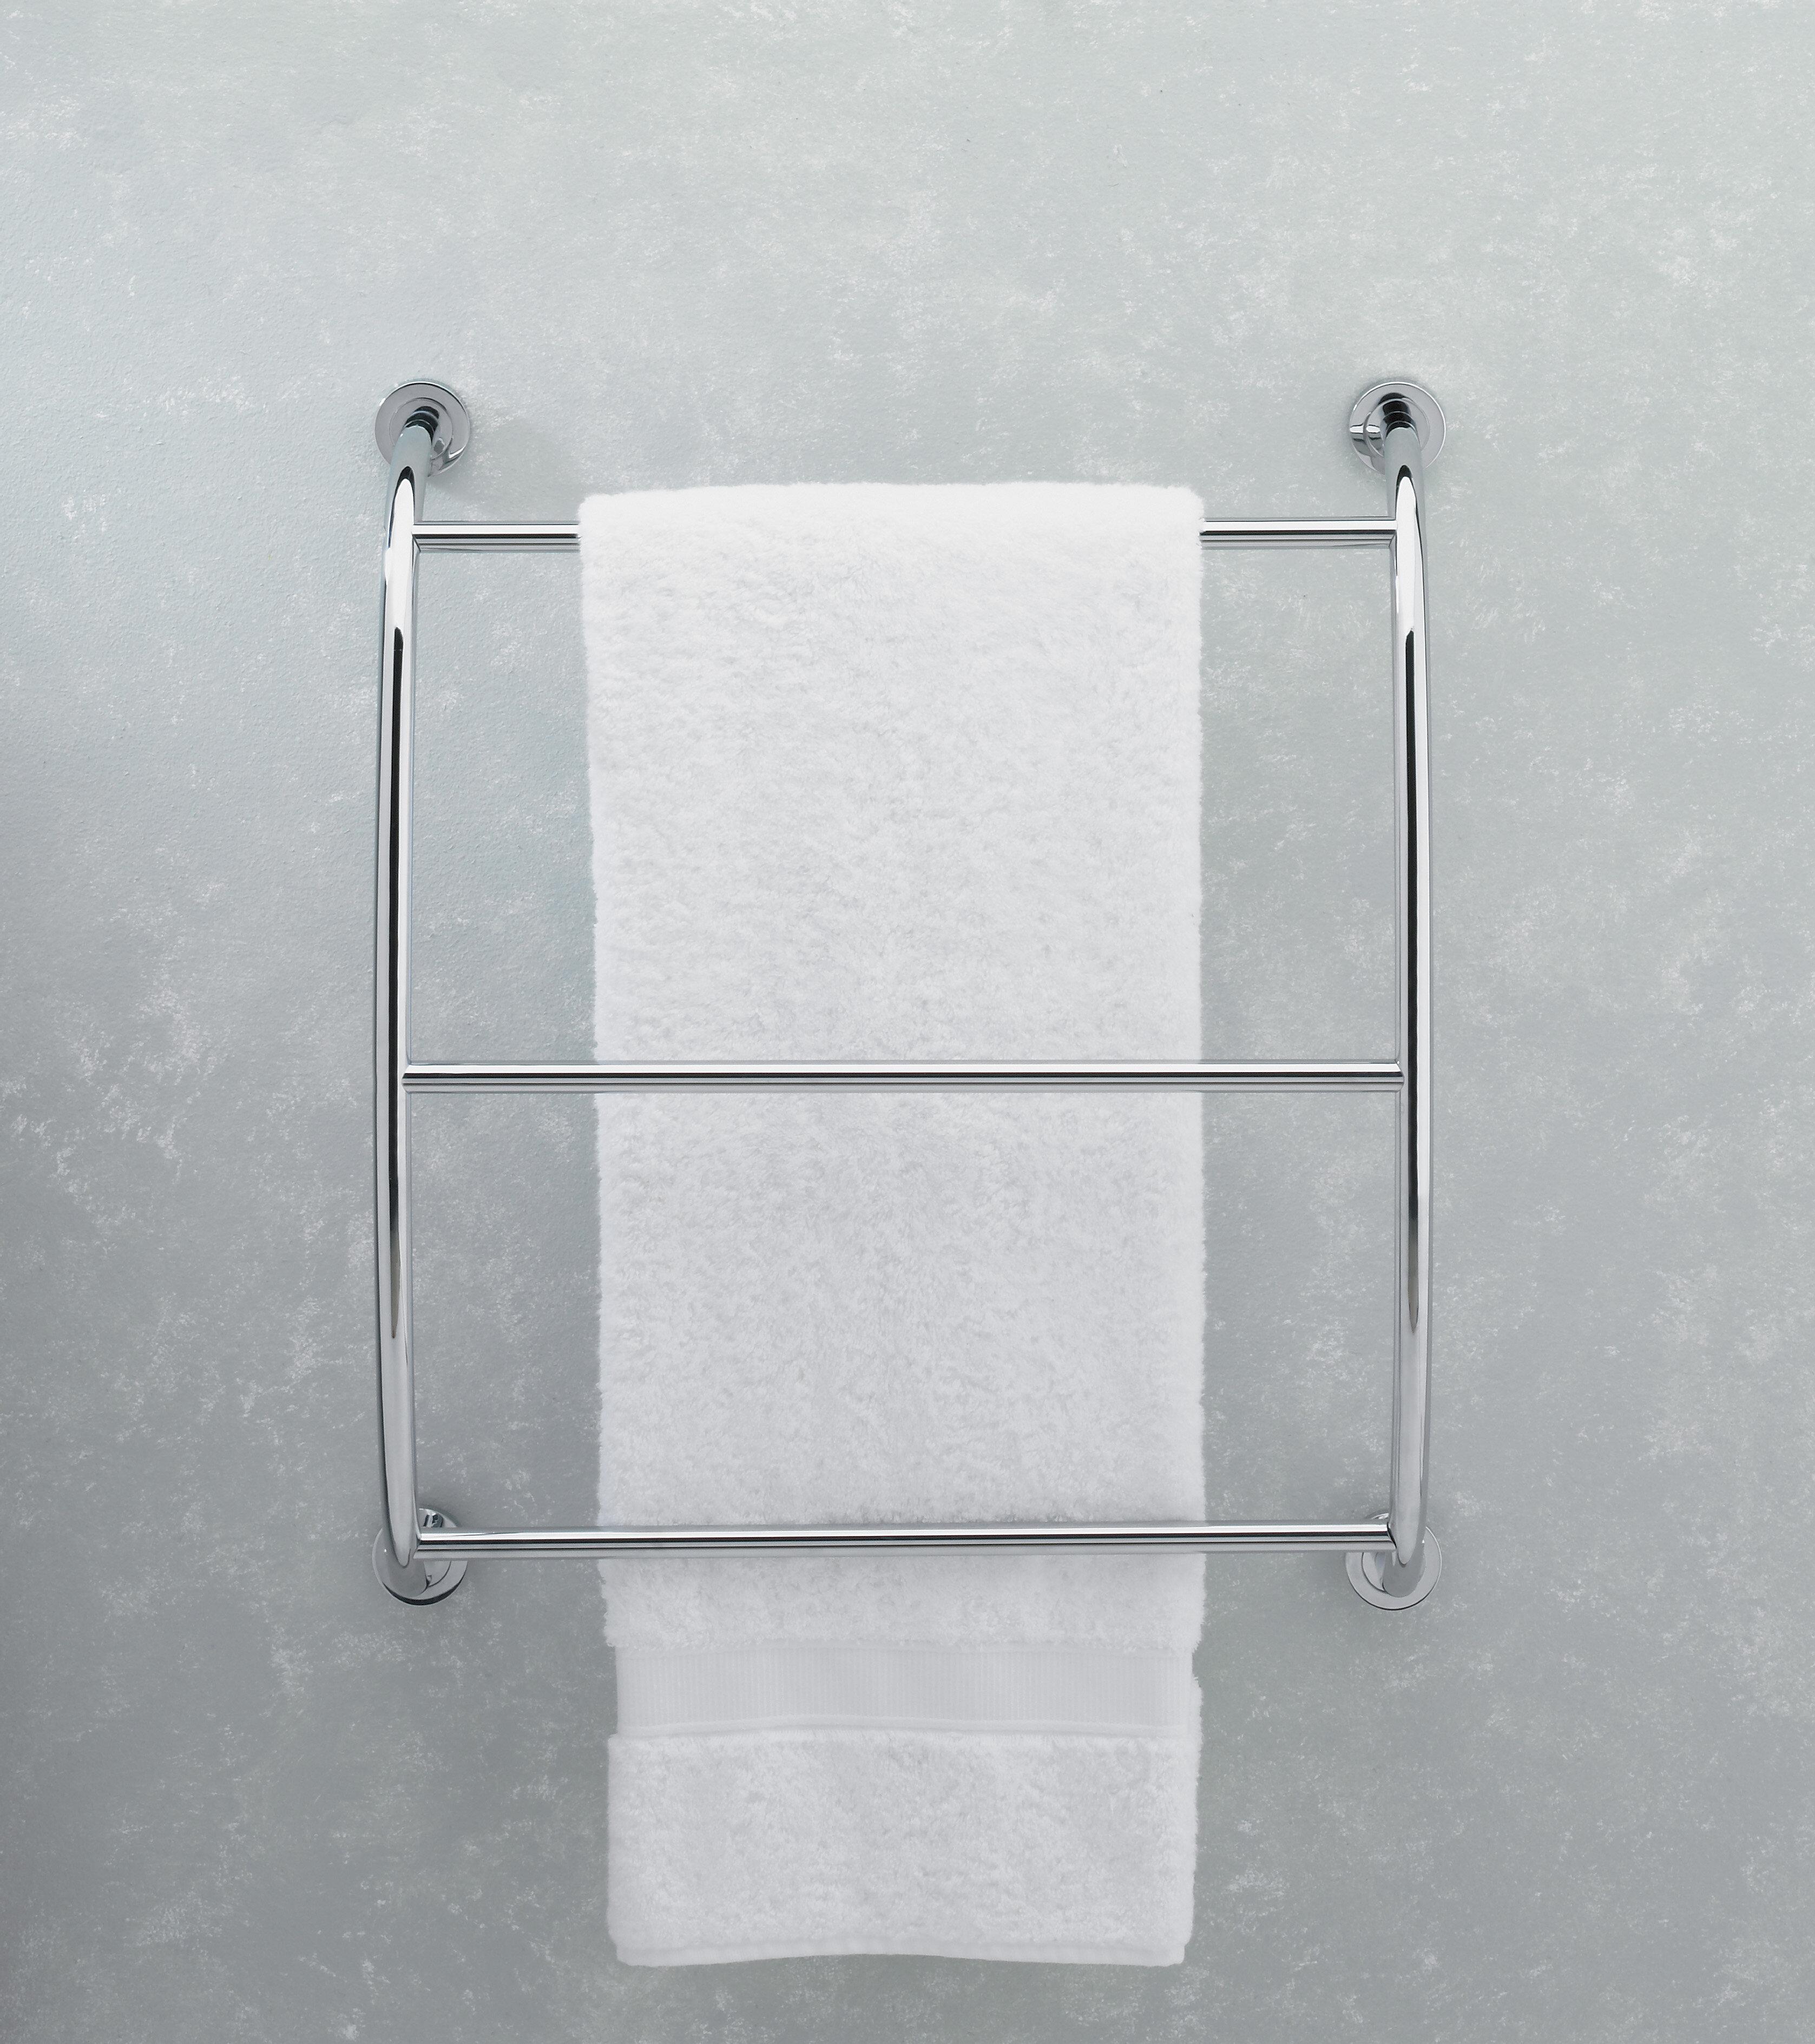 Stupendous Essentials Wall Mounted Towel Rack Download Free Architecture Designs Rallybritishbridgeorg